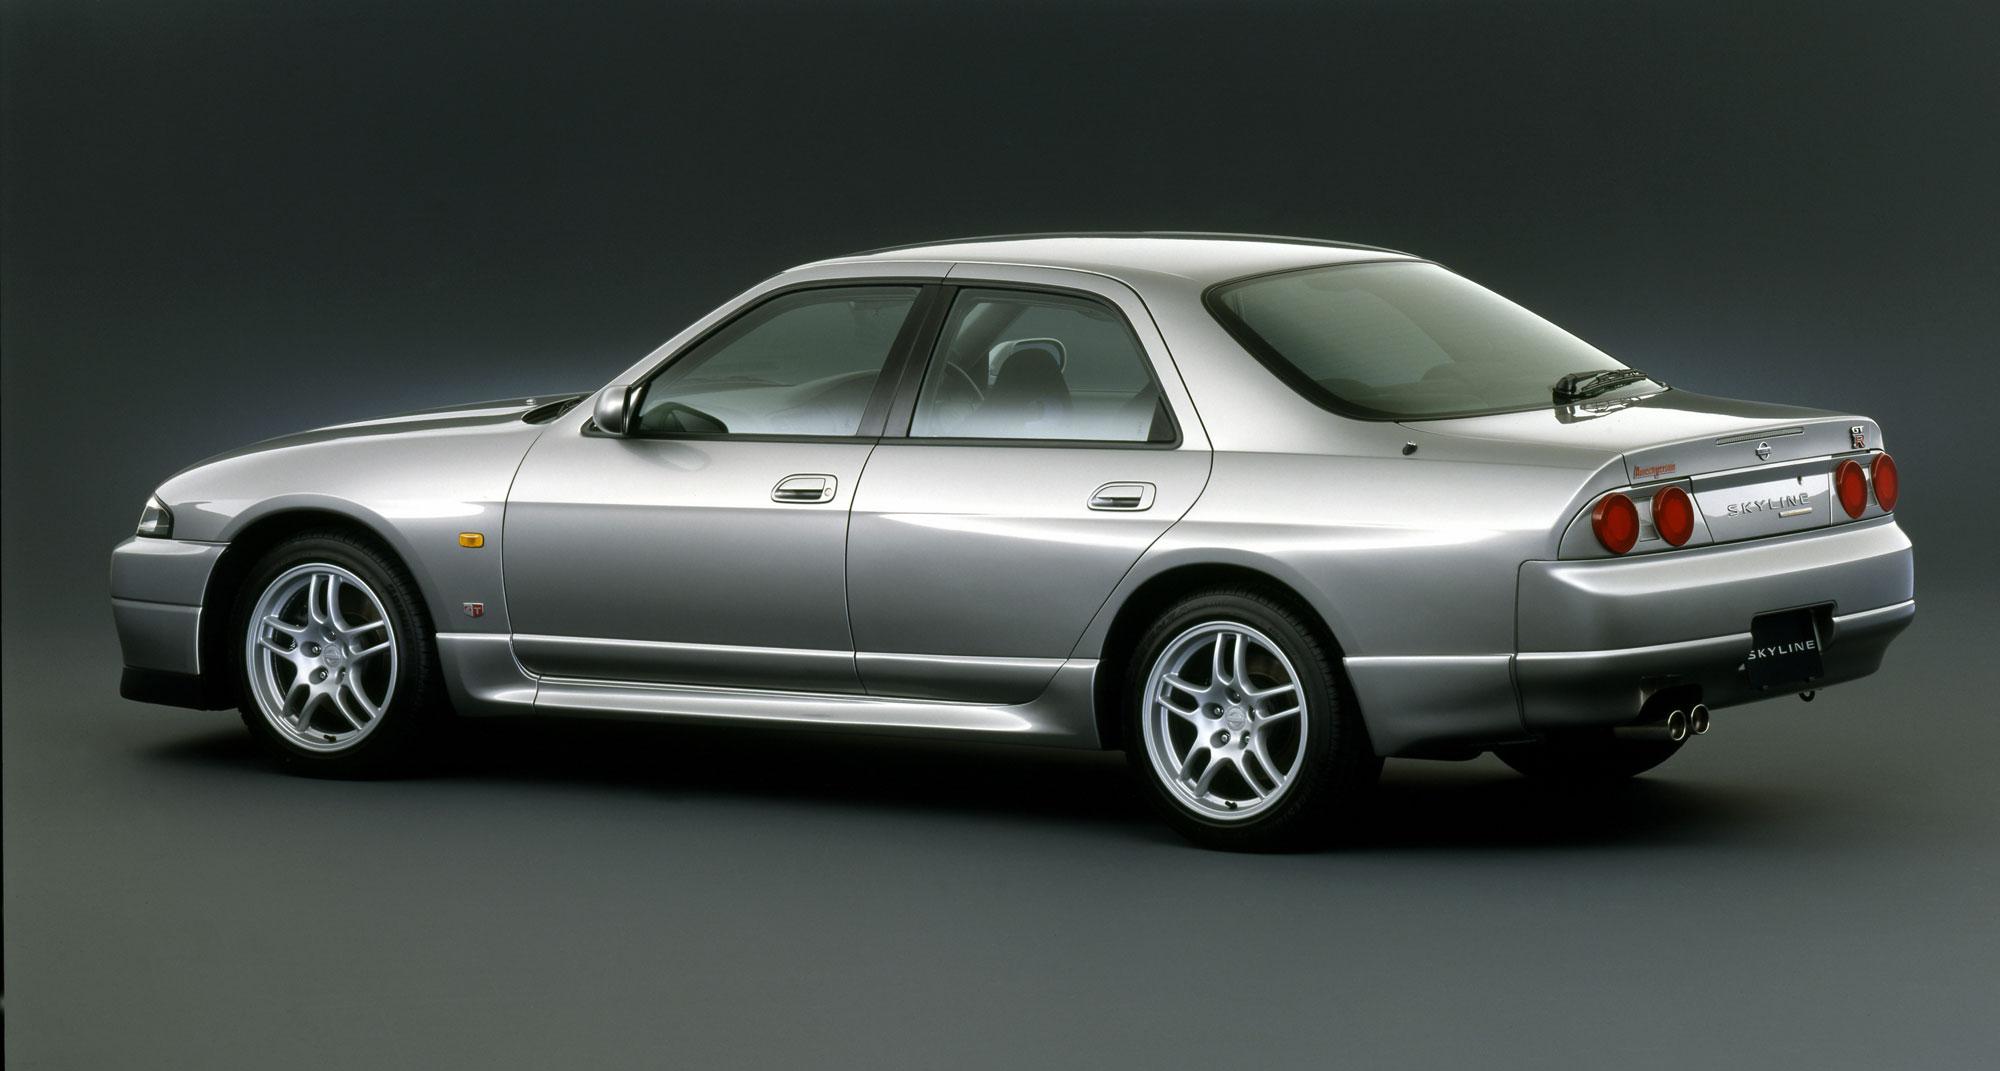 Nissan Skyline IX (R33) 1993 - 1998 Sedan #8